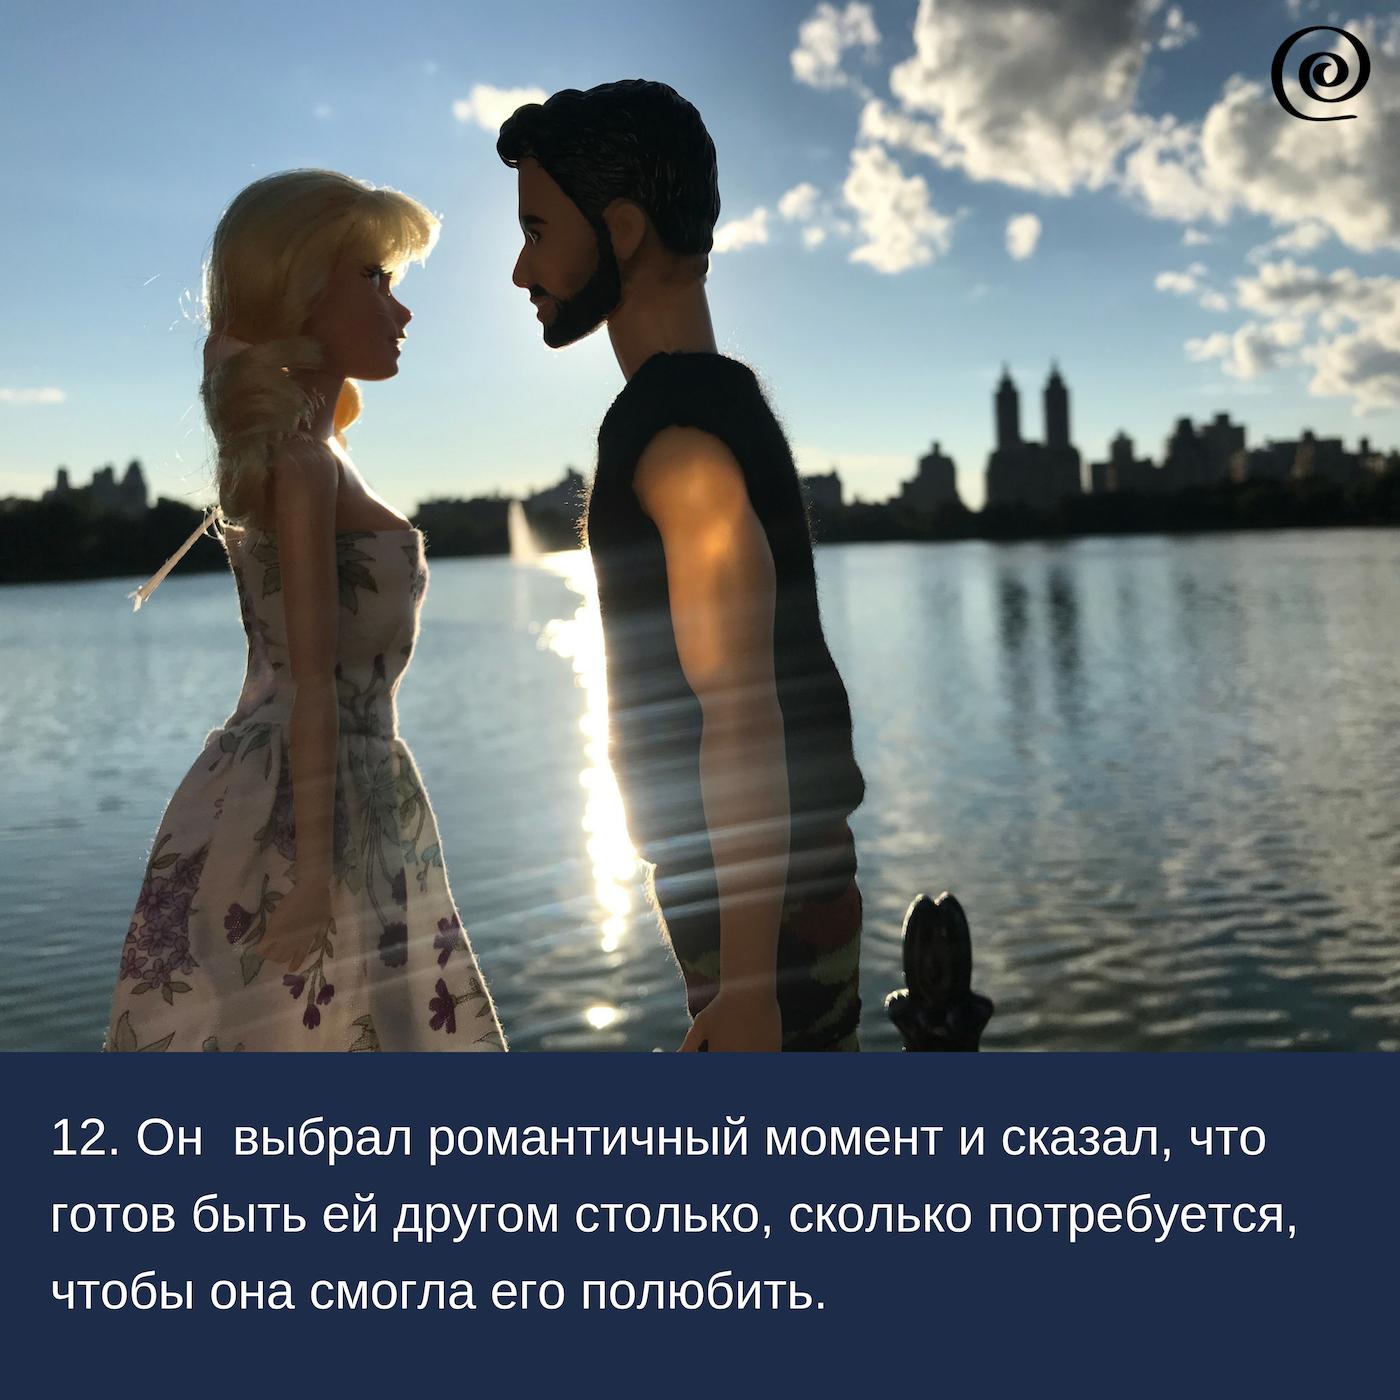 Фотосериал Разморозка. Сезон 8. Серия 4. Френдзона белоснежки. Эпизод 12